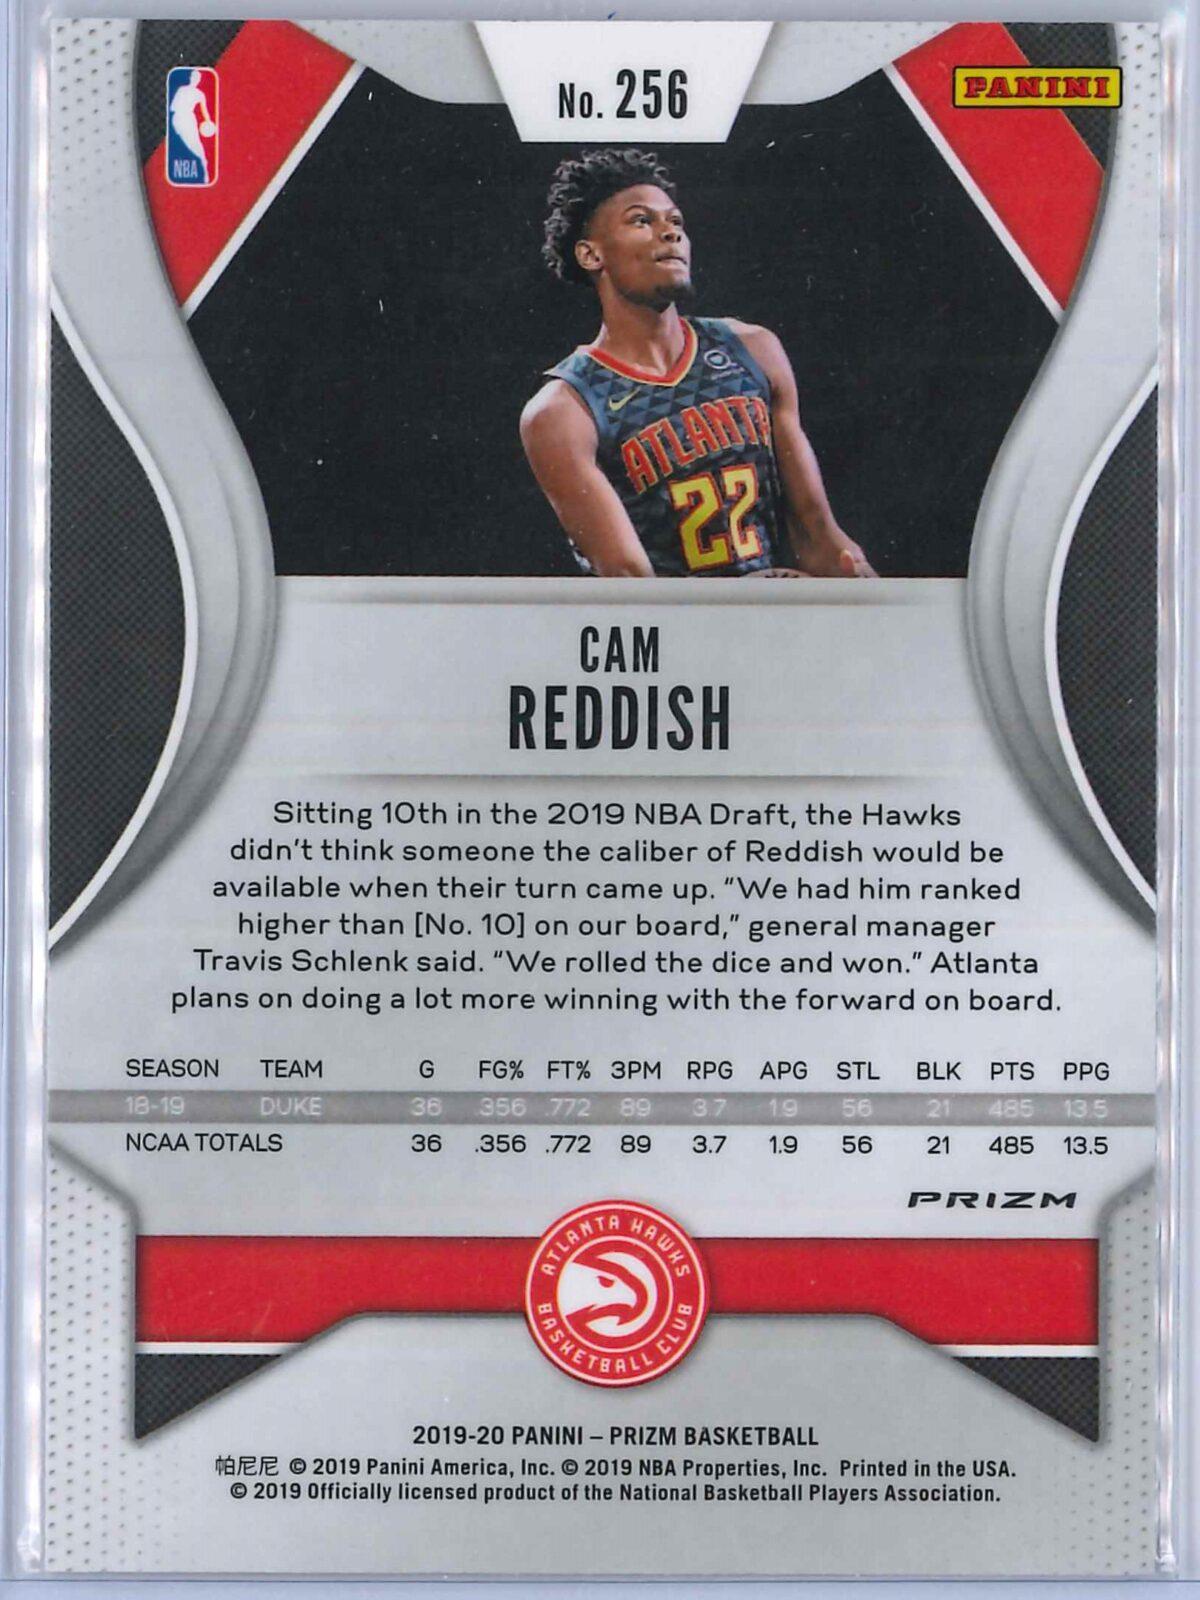 Cam Reddish (2) Panini Prizm 2019-20 Base RC Silver